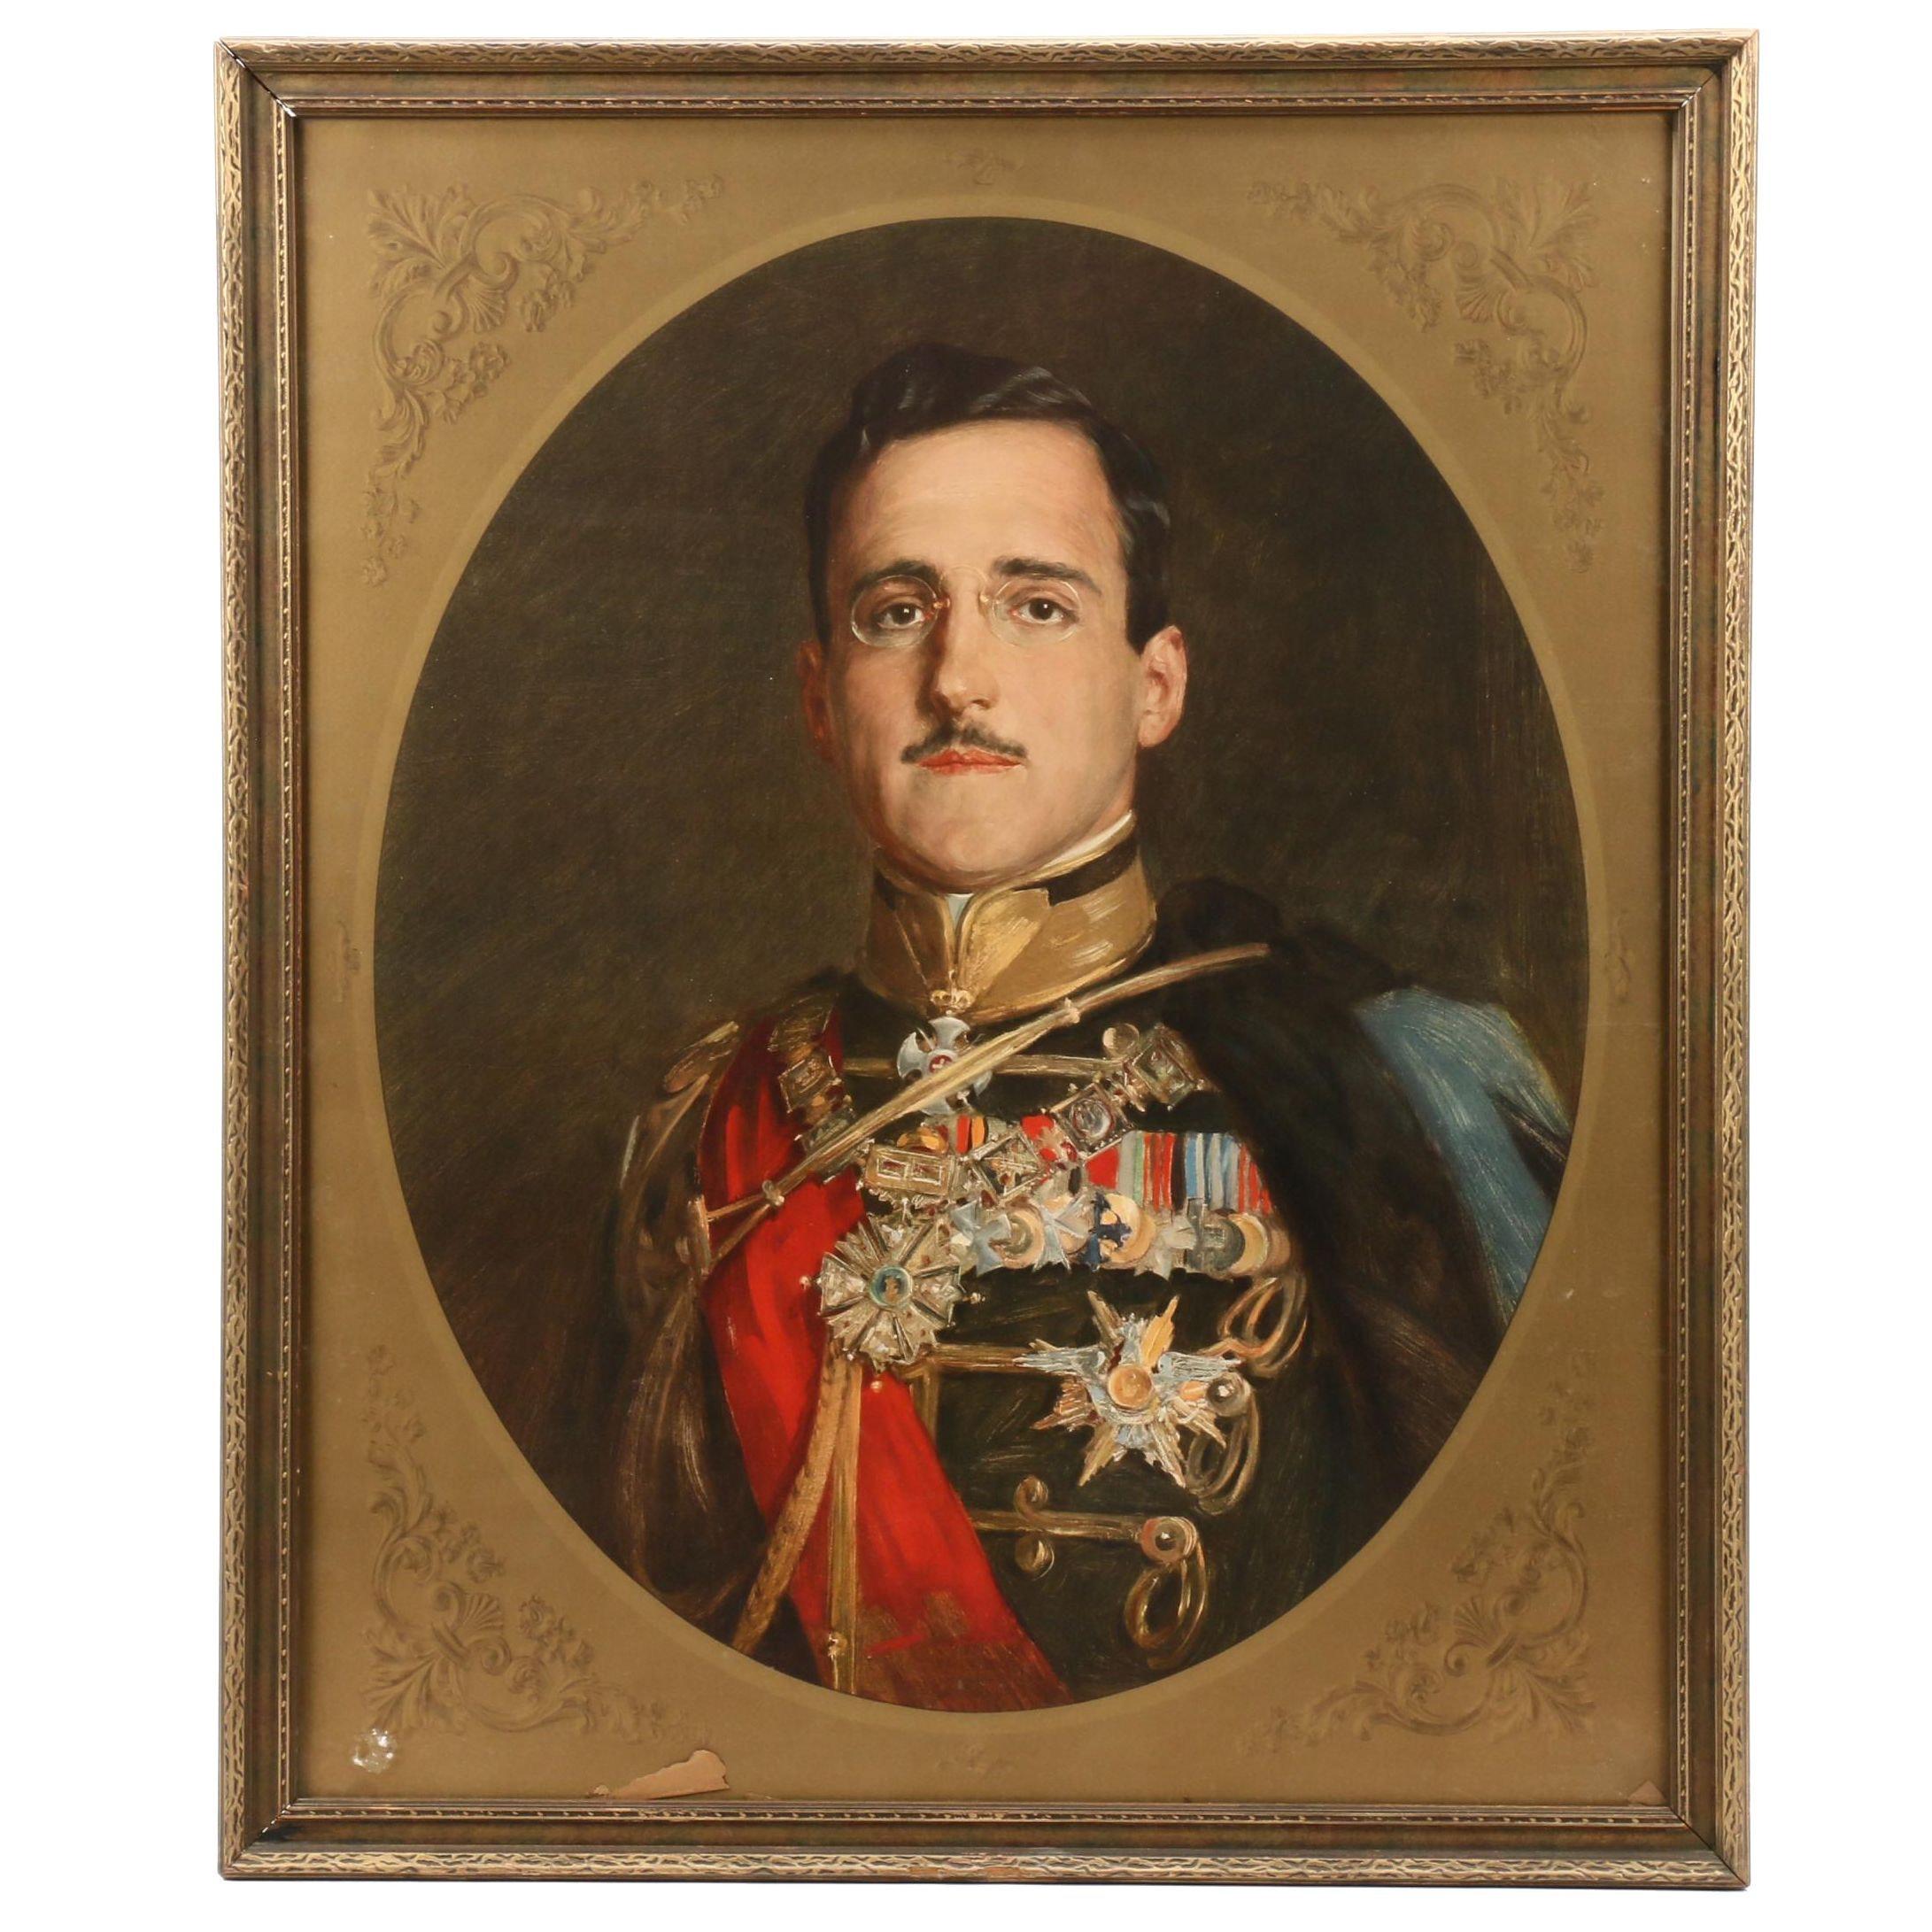 Color Collotype after Paja Jovanović Portrait of King Alexander I of Yugoslavia